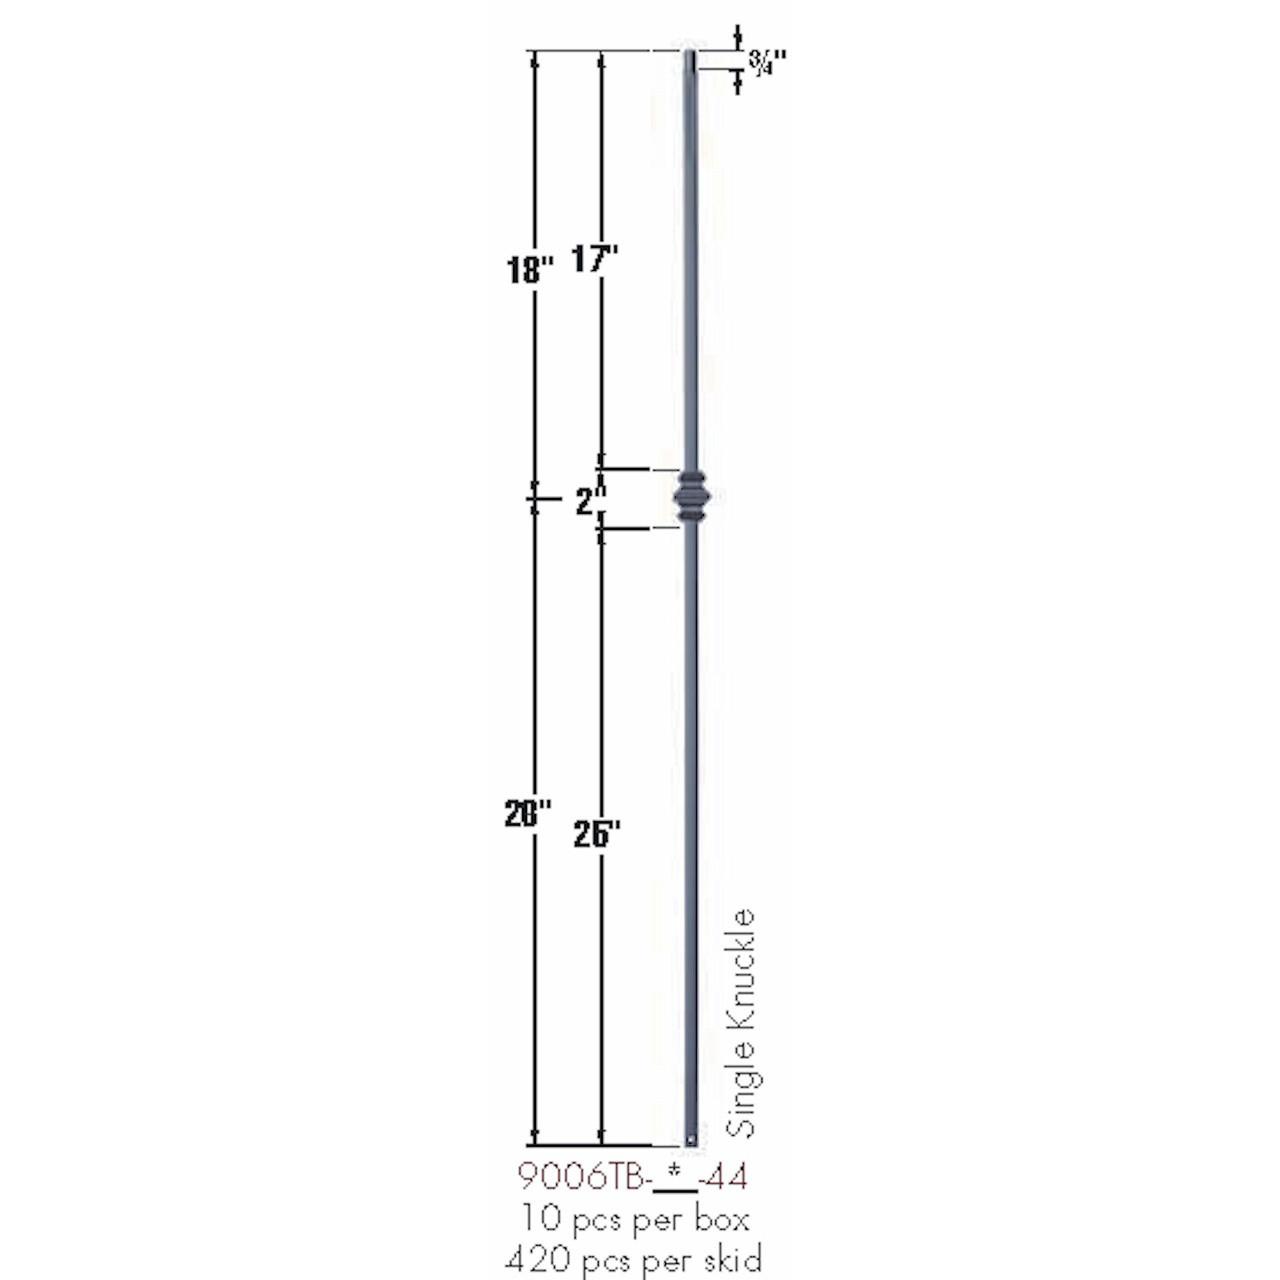 9006TB Satin Black Single Knuckle Tubular Steel Baluster Dimensional Information